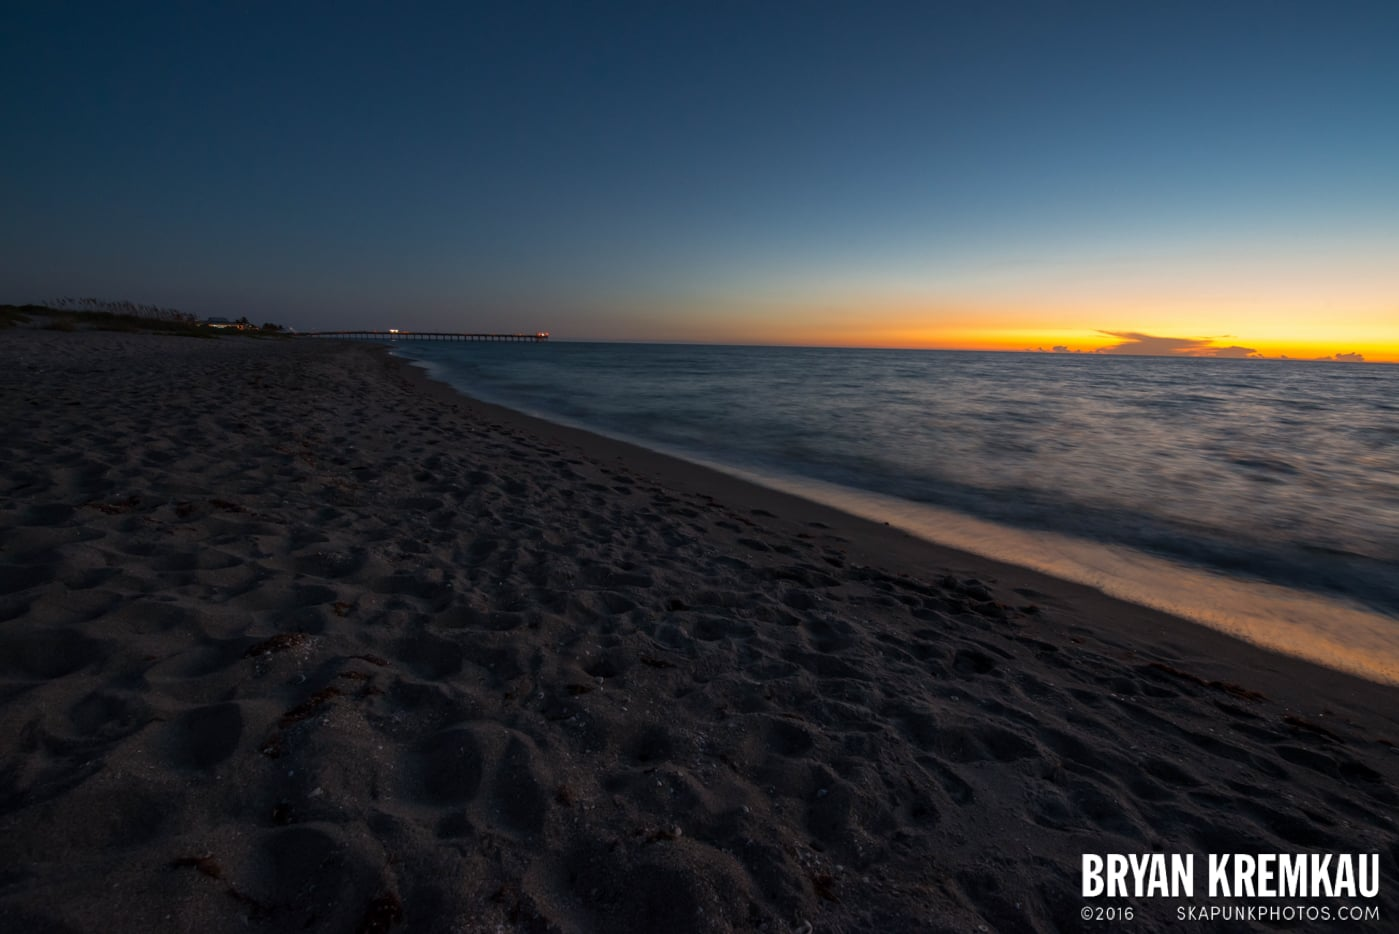 Sunsets, Astrophotography & Birds @ Venice, Florida - 10.25.14 - 11.5.14 (106)